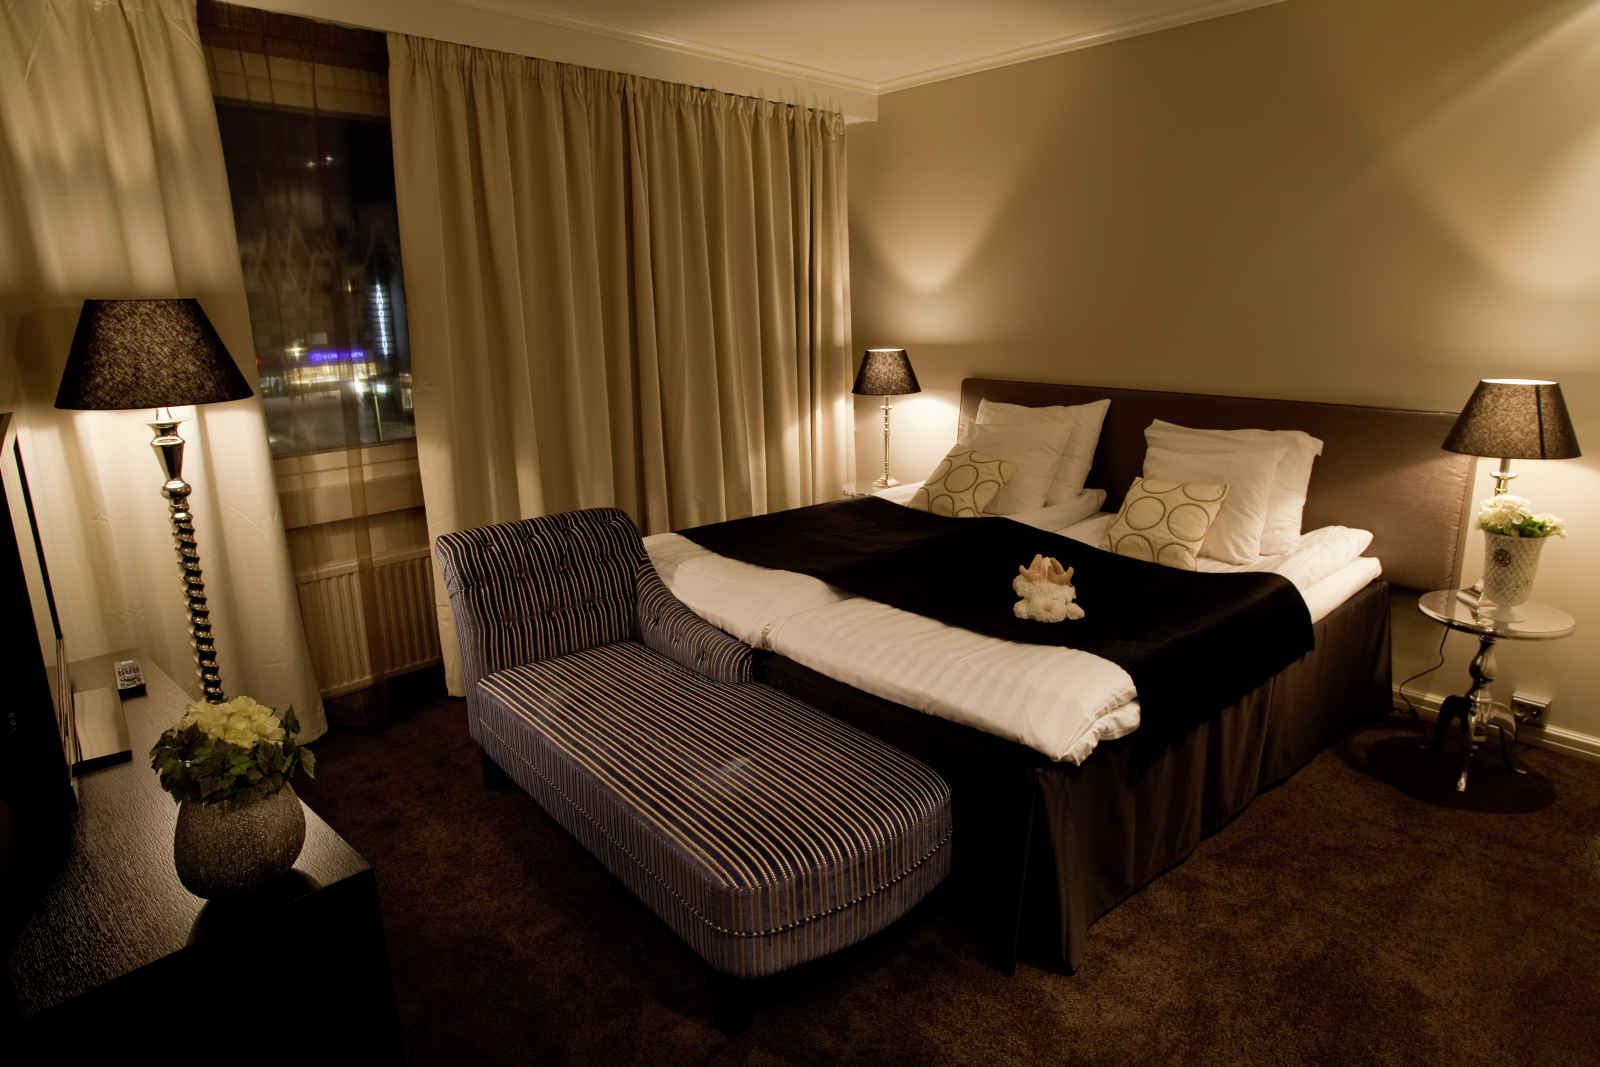 Arctic City hotel - 5 jours / 4 nuits 4 *